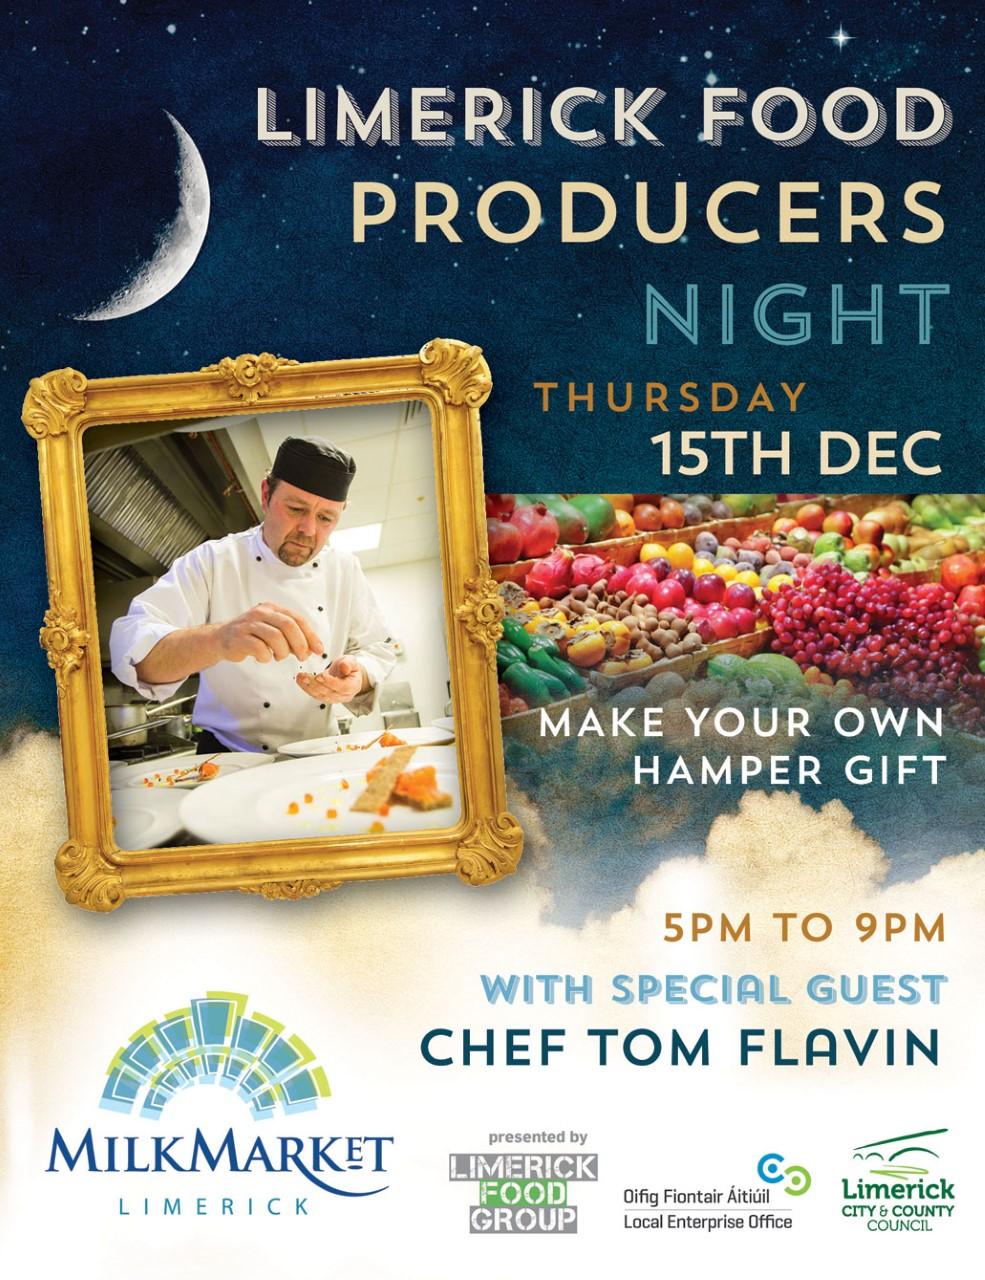 Limerick Food Group Presents Christmas Food Producers Evening